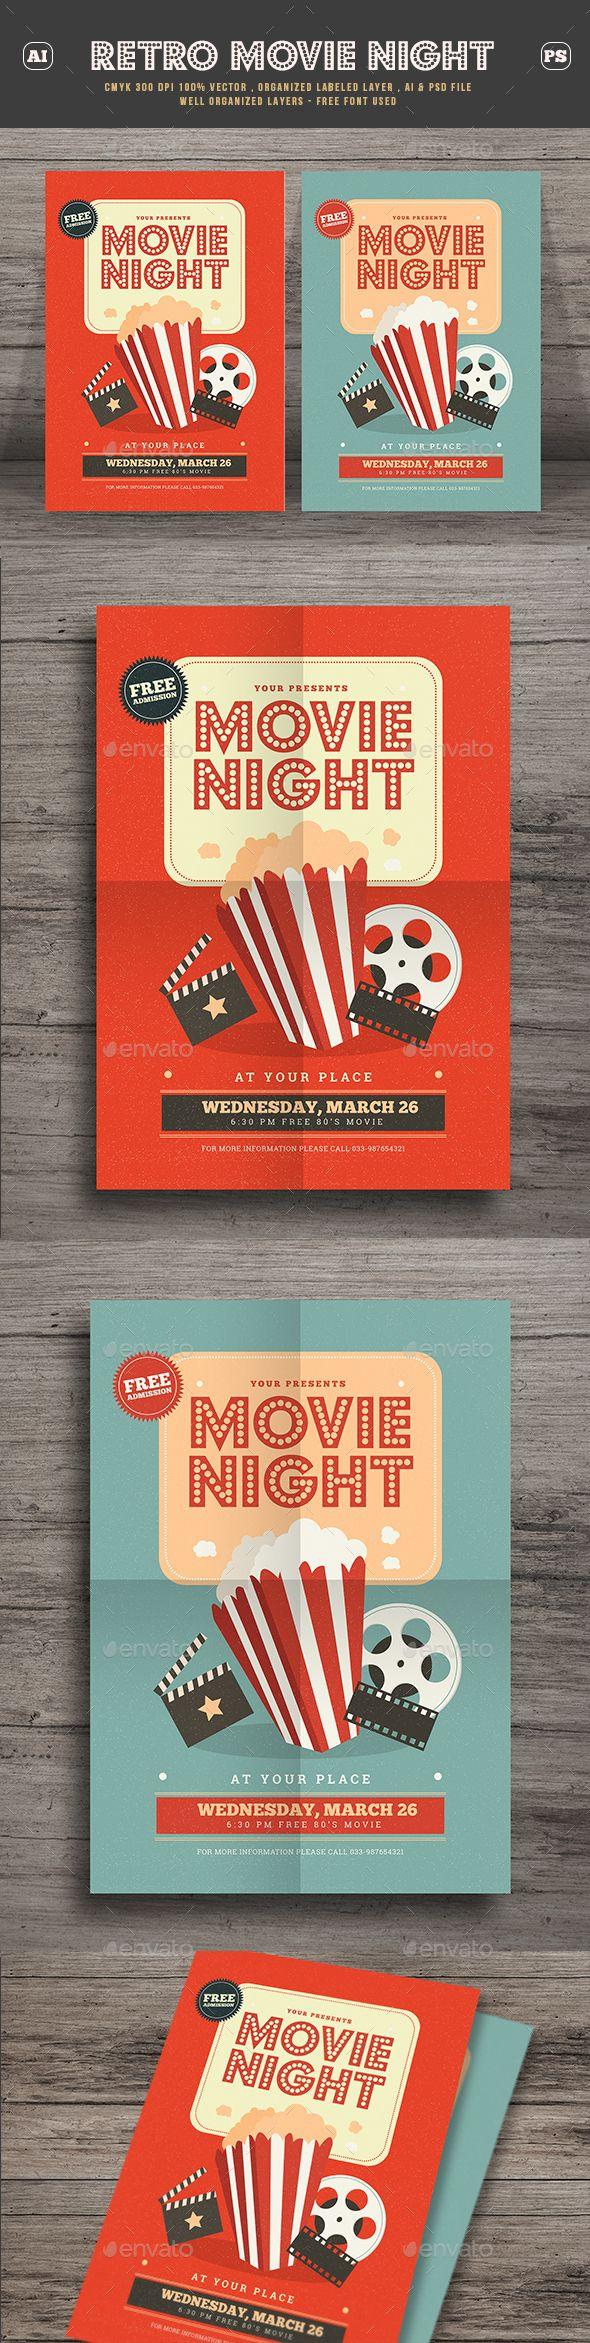 Retro Movie Festival Flyer — Psd Template #fest #clapboard • Download ➝  Https://graphicriver.net/item/retro-Movie-Fest… | Retro Vintage Flyer  Template